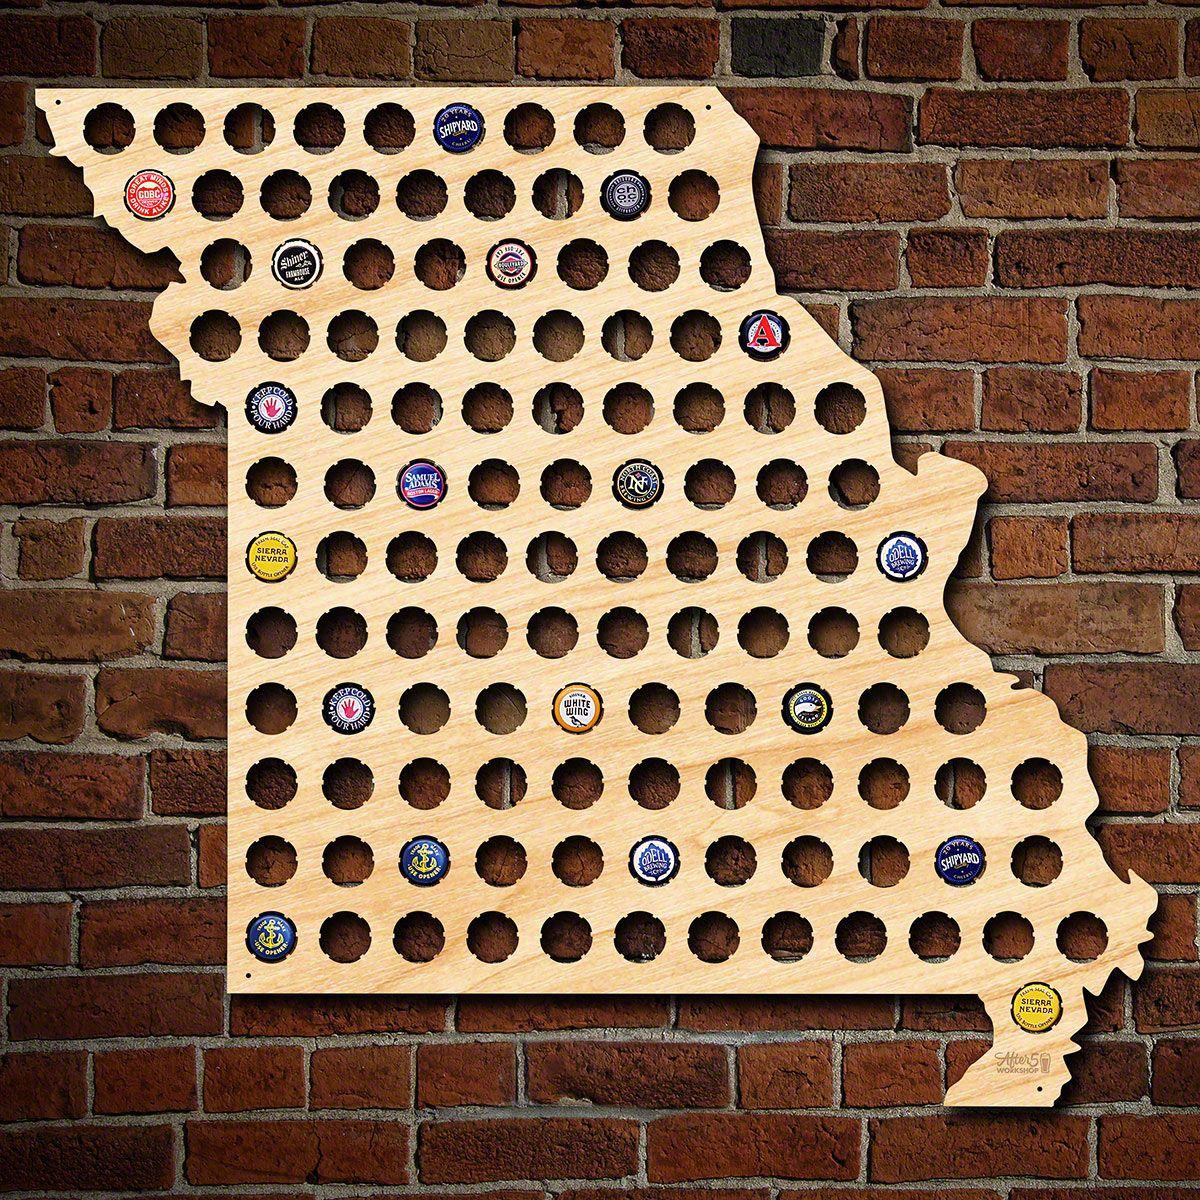 Giant XL Missouri Beer Cap Map